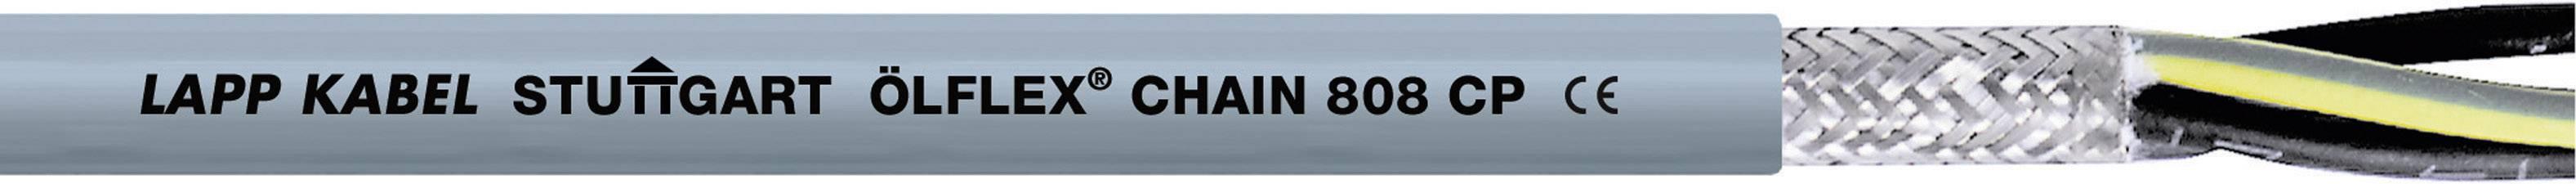 Žíla kabelu LappKabel ÖLFLEX CHAIN 808 CP 3G1,5 (1027776), 3x 1,5 mm², polyurethan, Ø 7,5 mm, stíněný, 100 m,